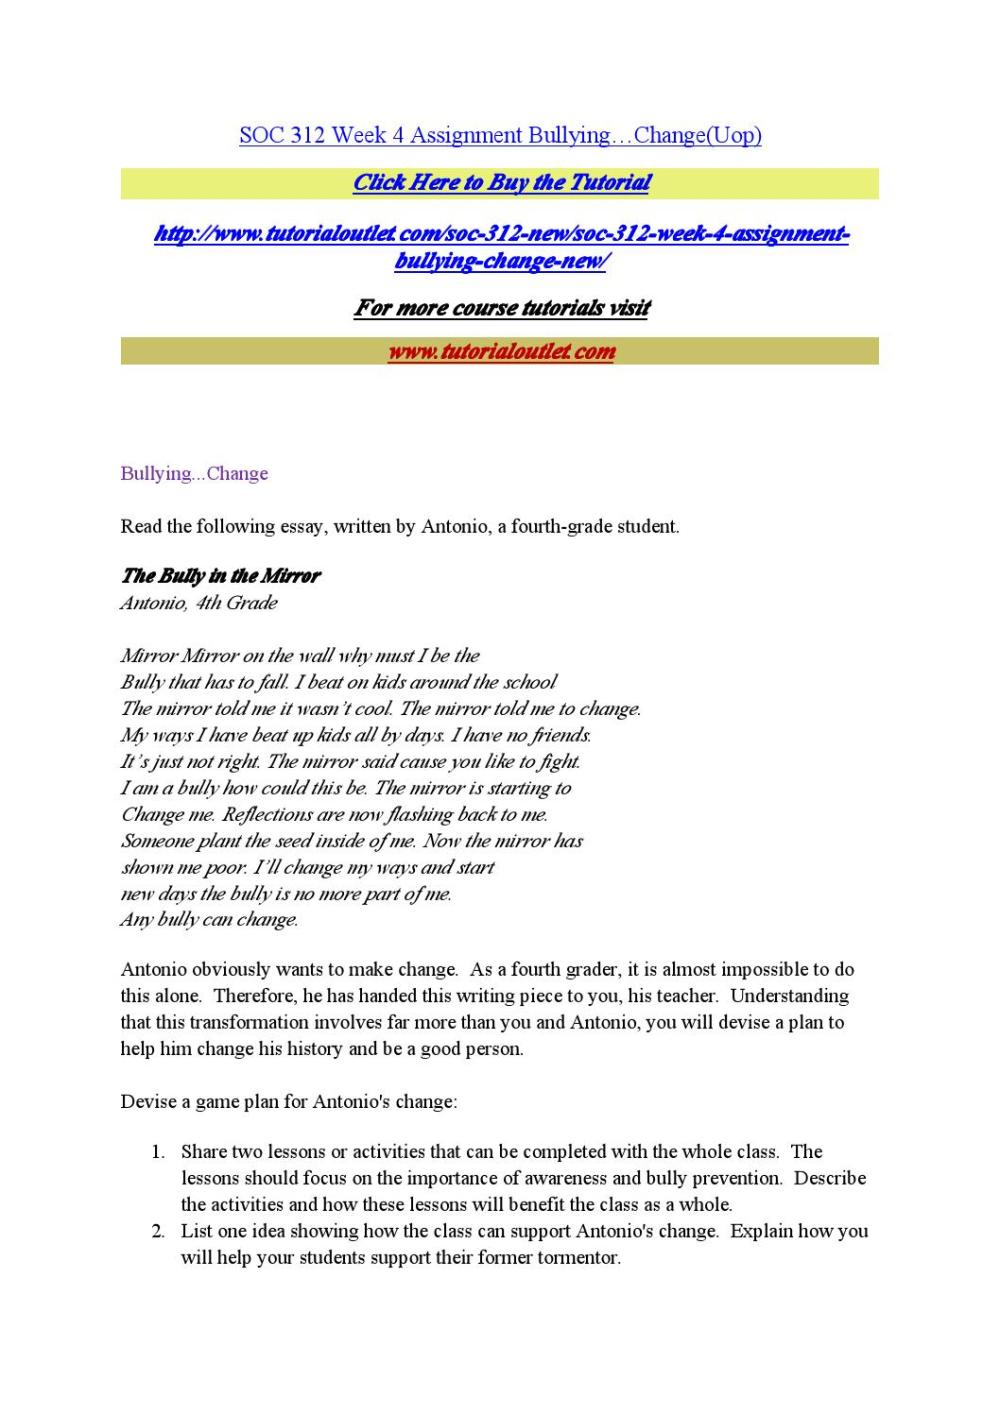 medium resolution of Bullying Activities For 4th Graders - bullying